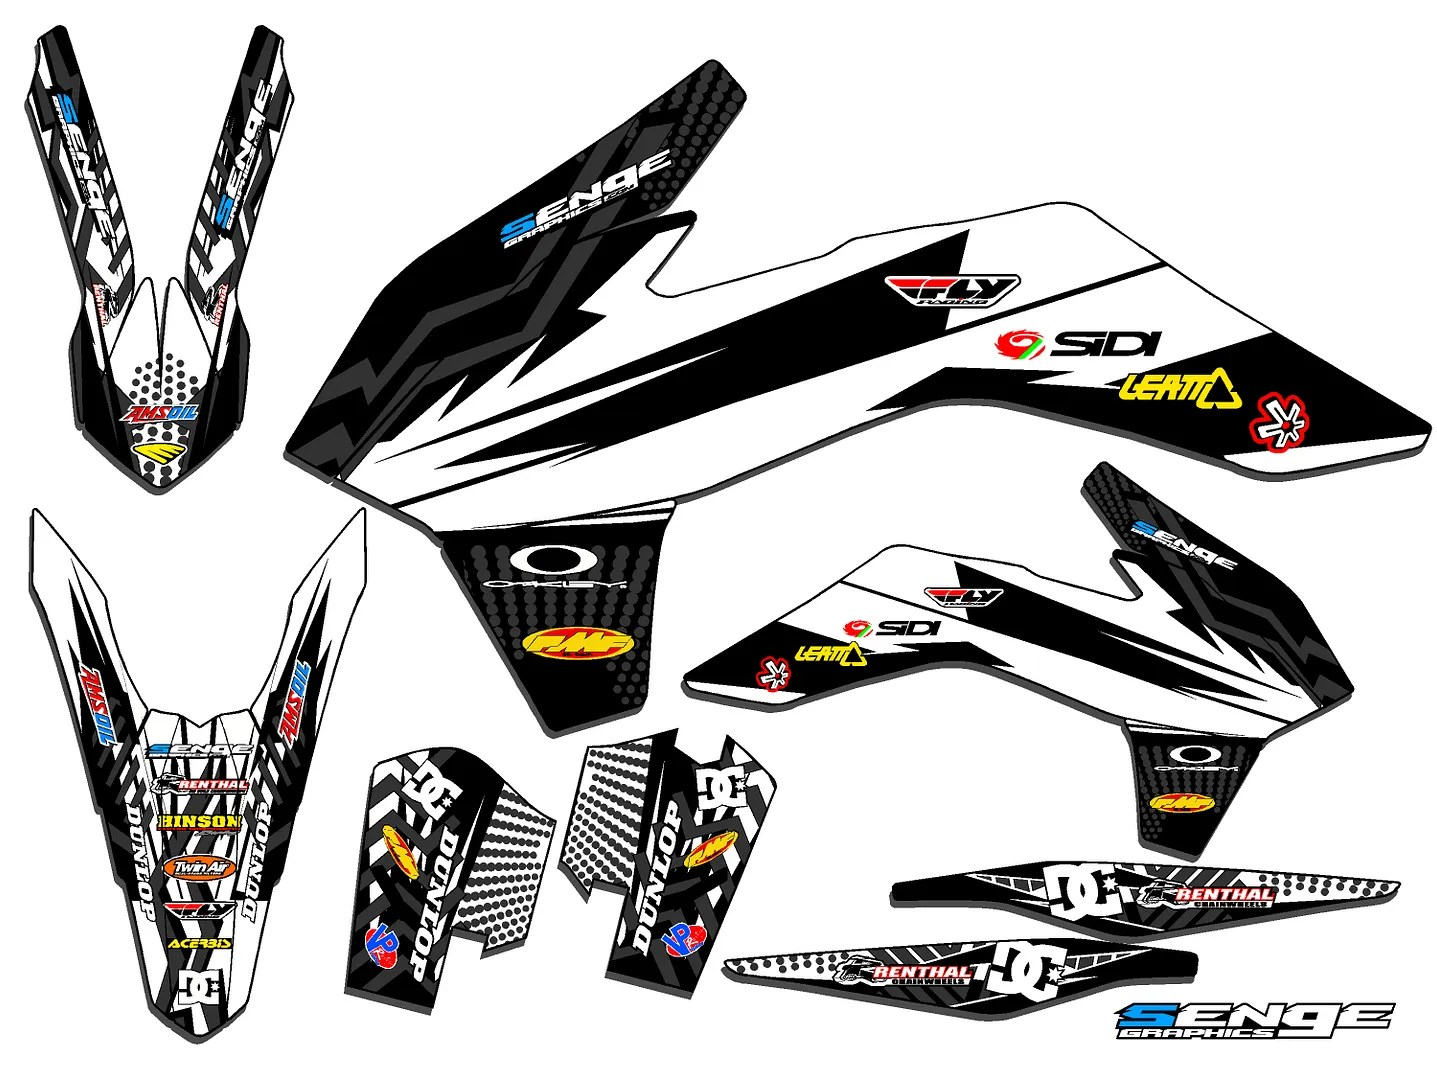 FITS KTM 2014 EXC 250 350 450 500 GRAPHICS KIT DECALS DECO